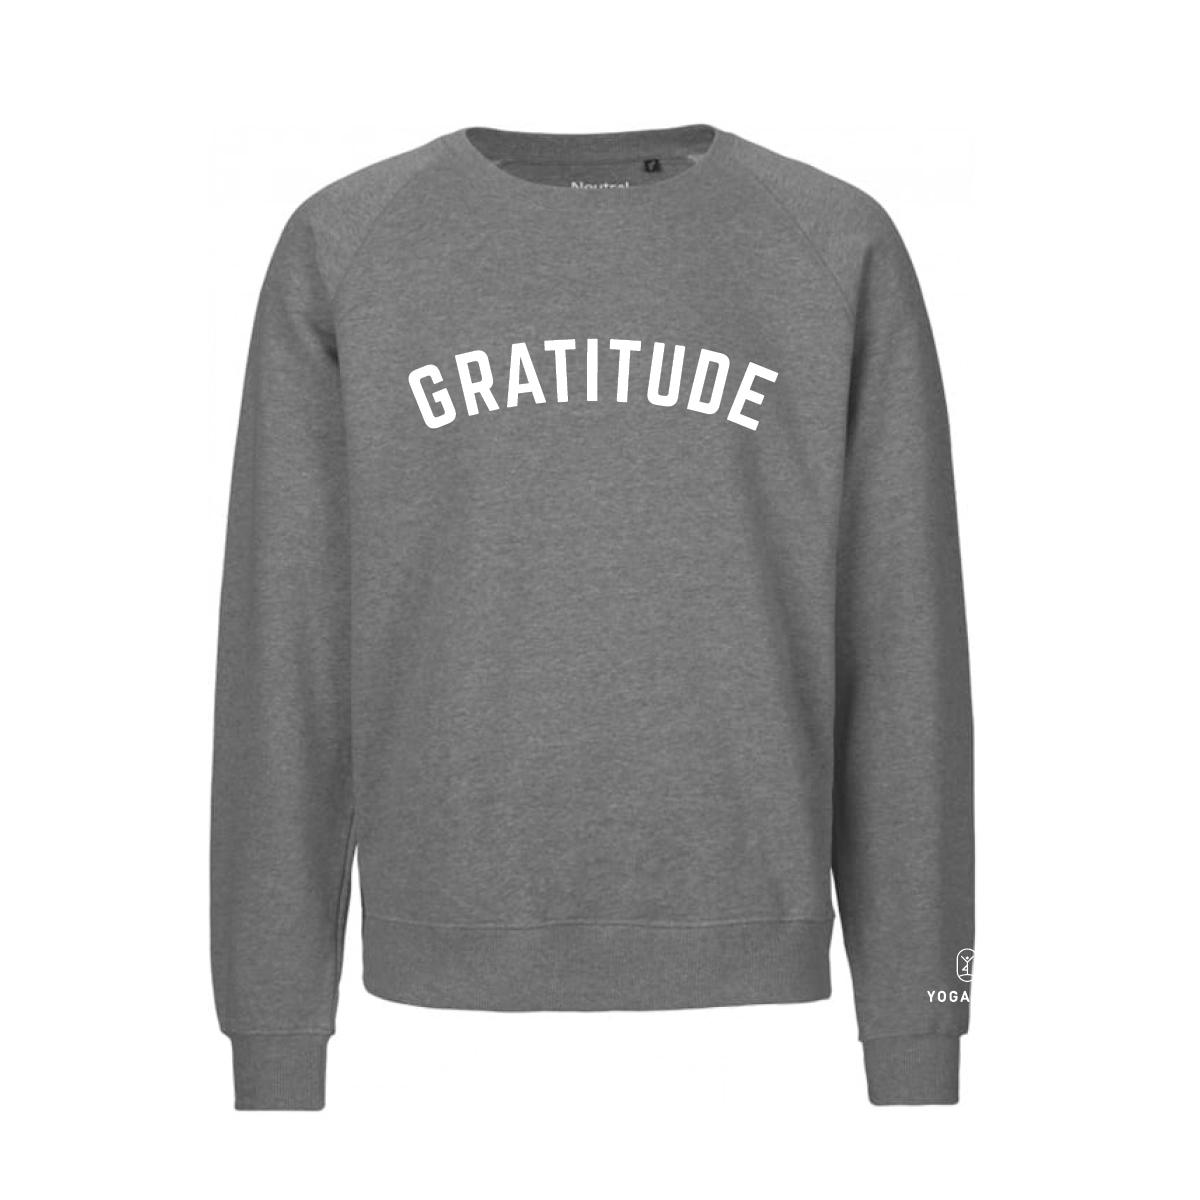 YOGALIFE Bio-Fairtrade-Sweater GRATITUDE